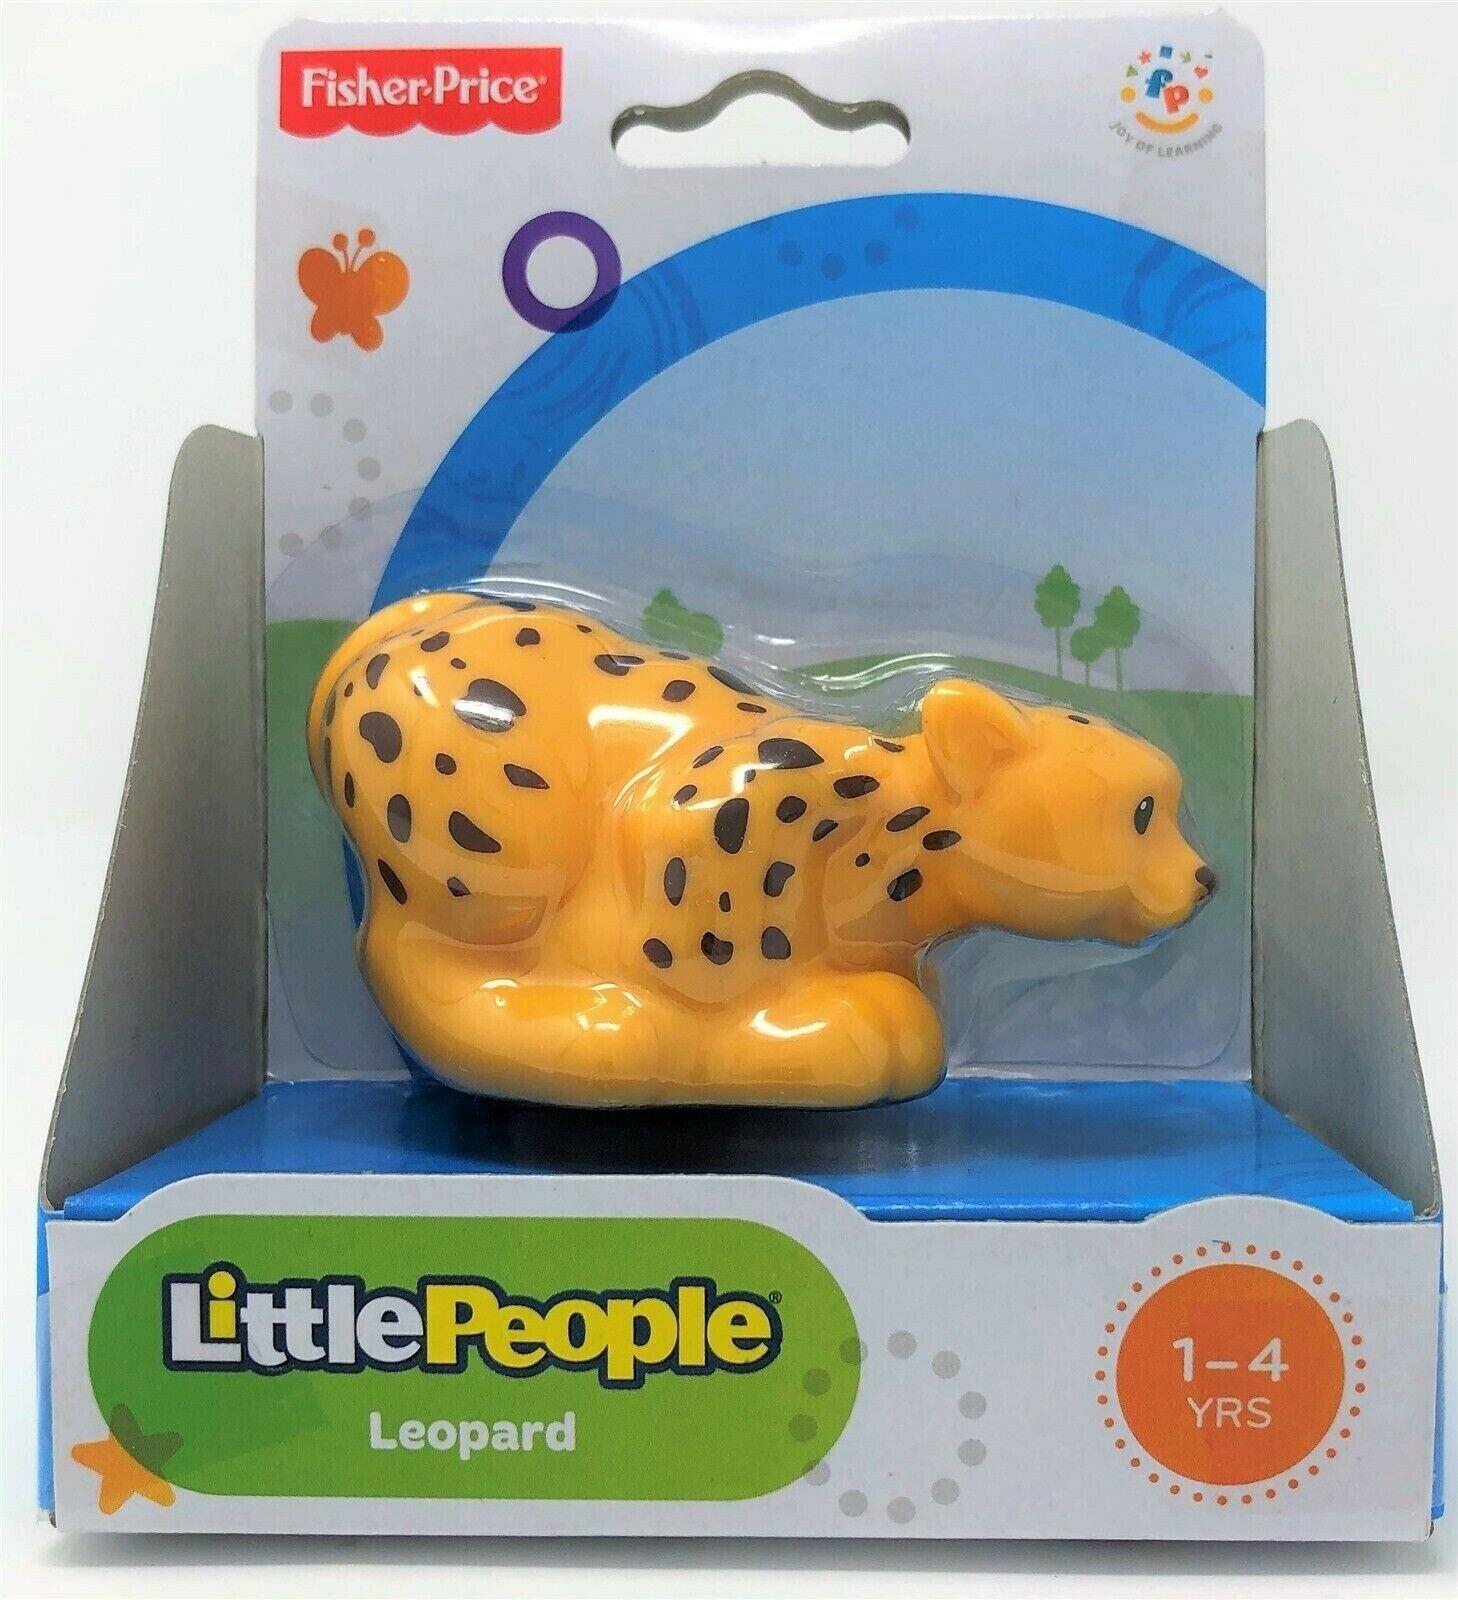 Fisher-Price Little People Leopard Animal Zoo Wildlife Safari Figure Toy